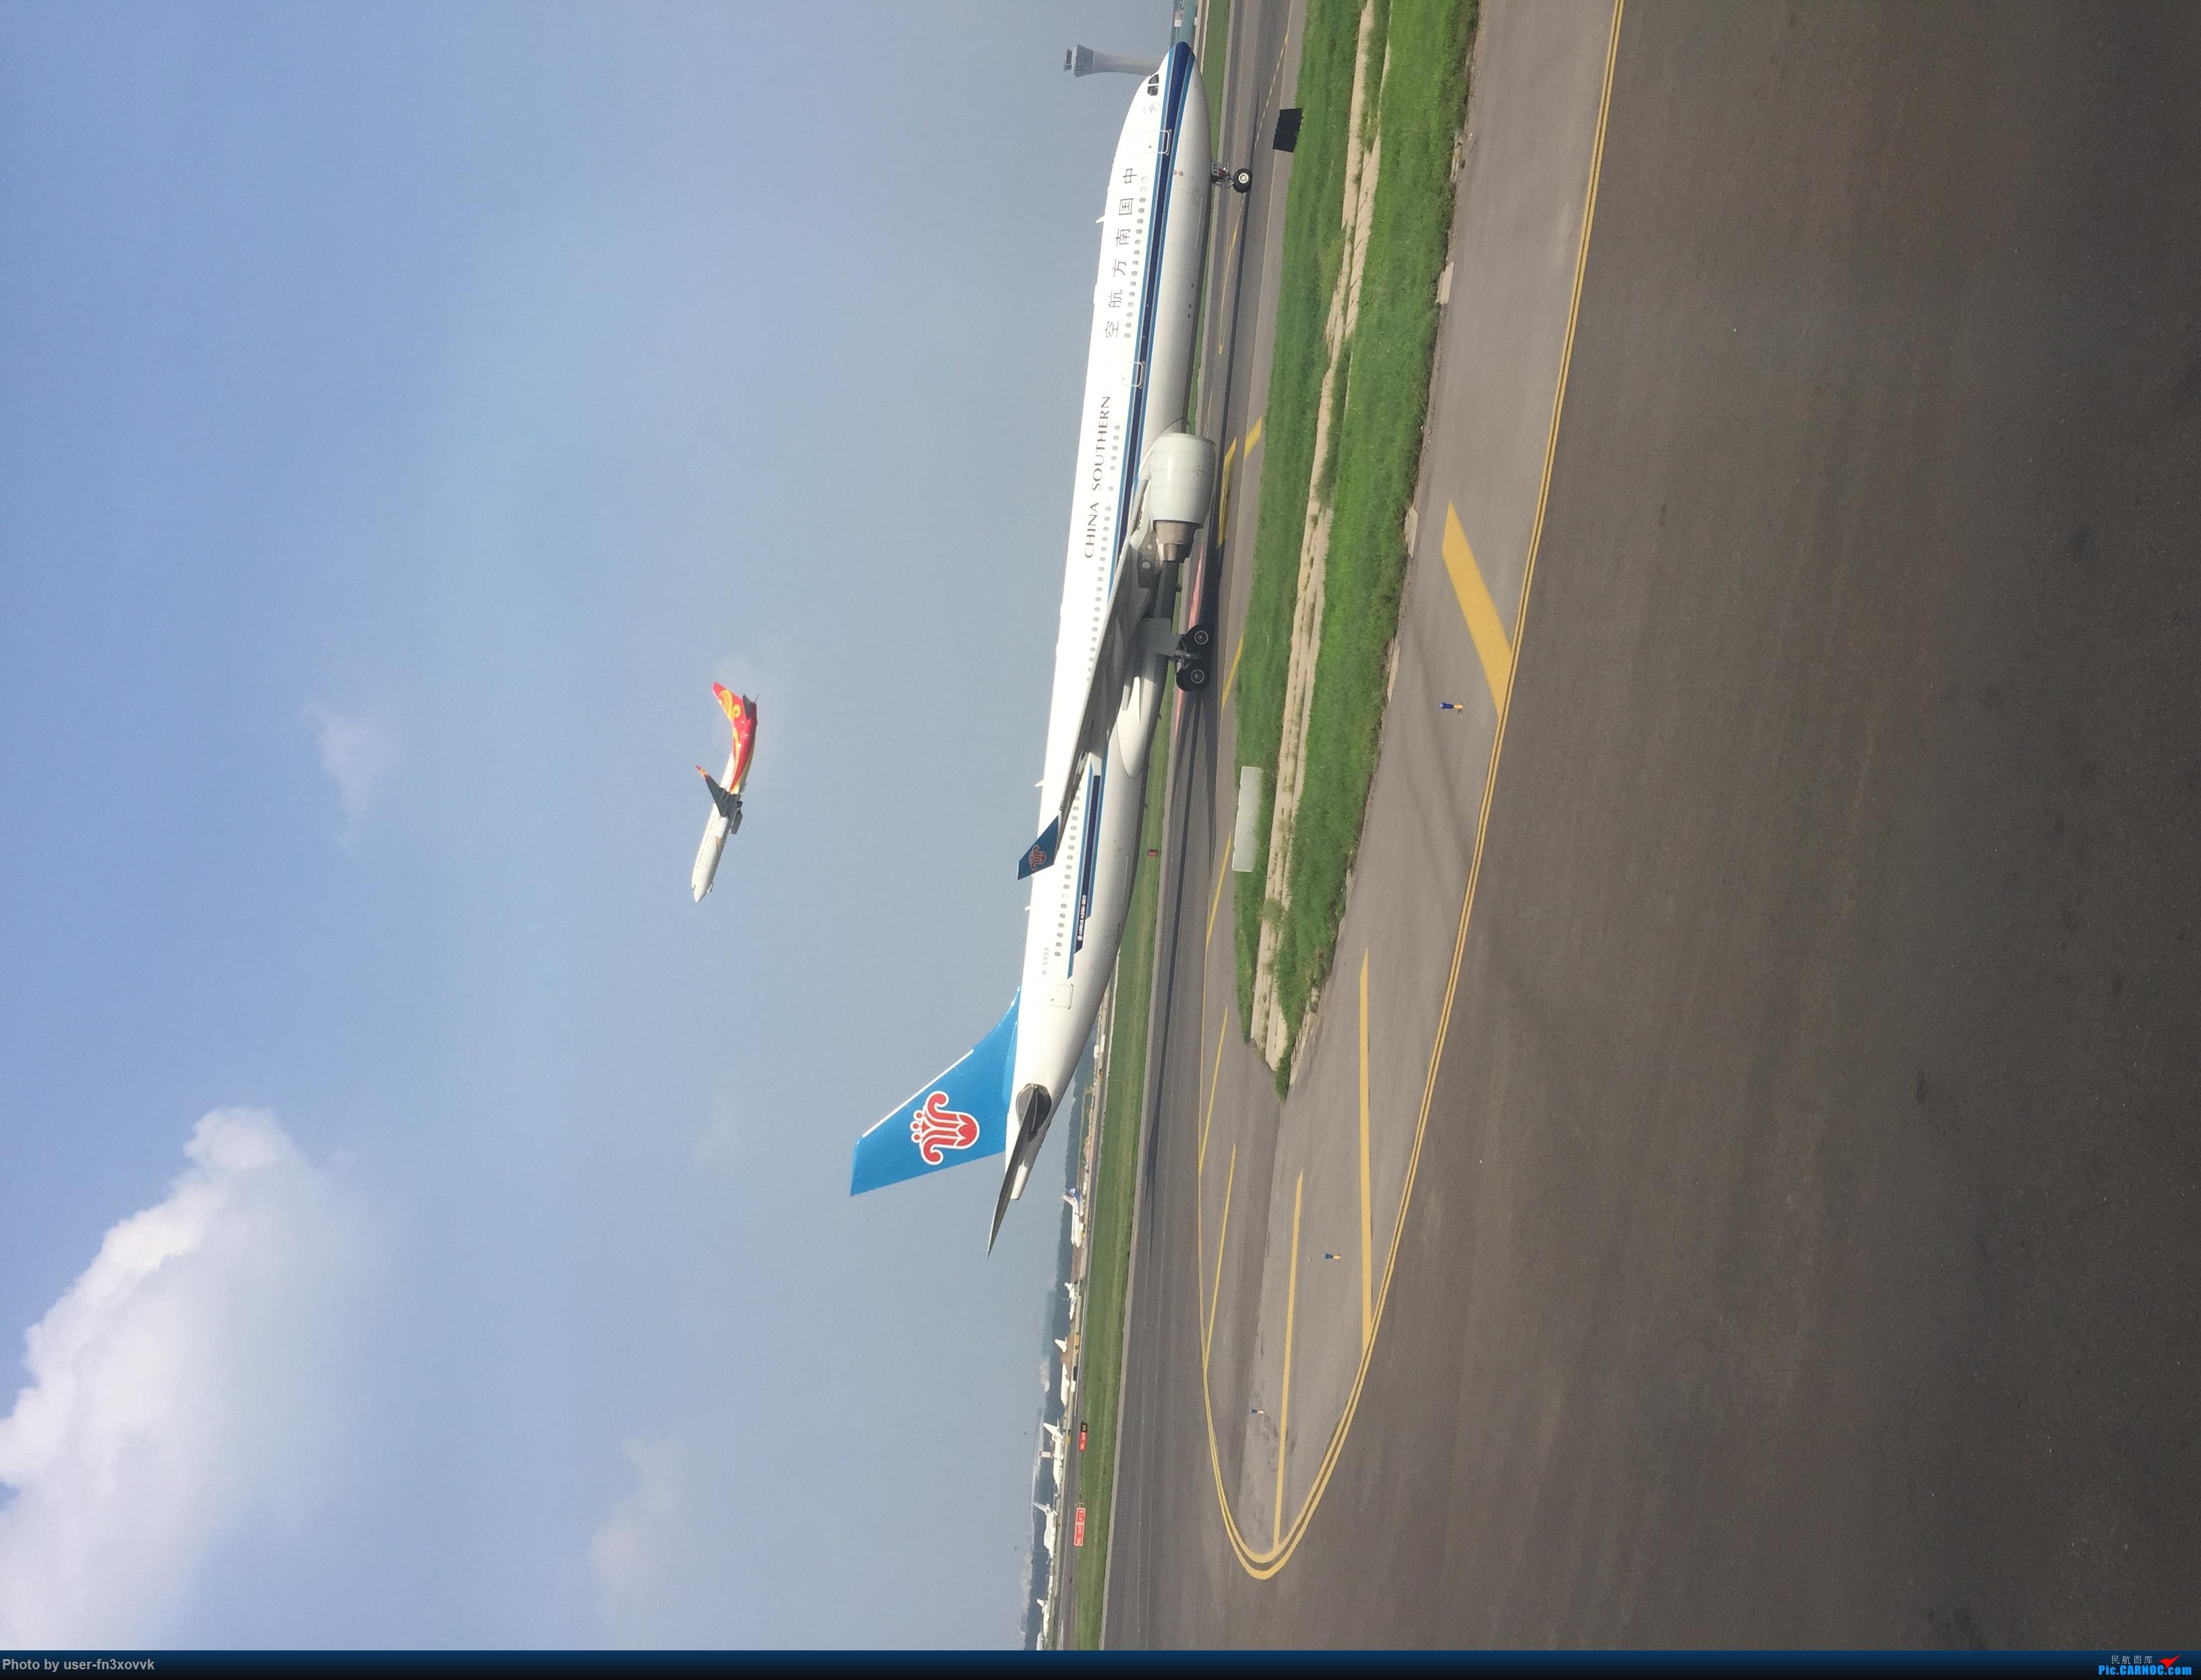 Re:[原创]【user-fn3xowk的游记】第二季第一集 MU2112&MU9641解锁新机型A319及深夜航班 AIRBUS A321NEO